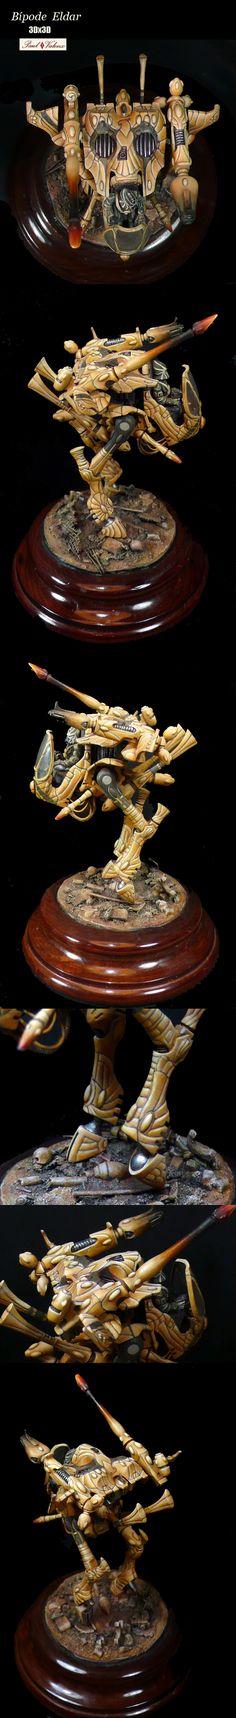 Bípode Eldar 3Dx3D, Warwalker. Warhammer 40k Miniatures.